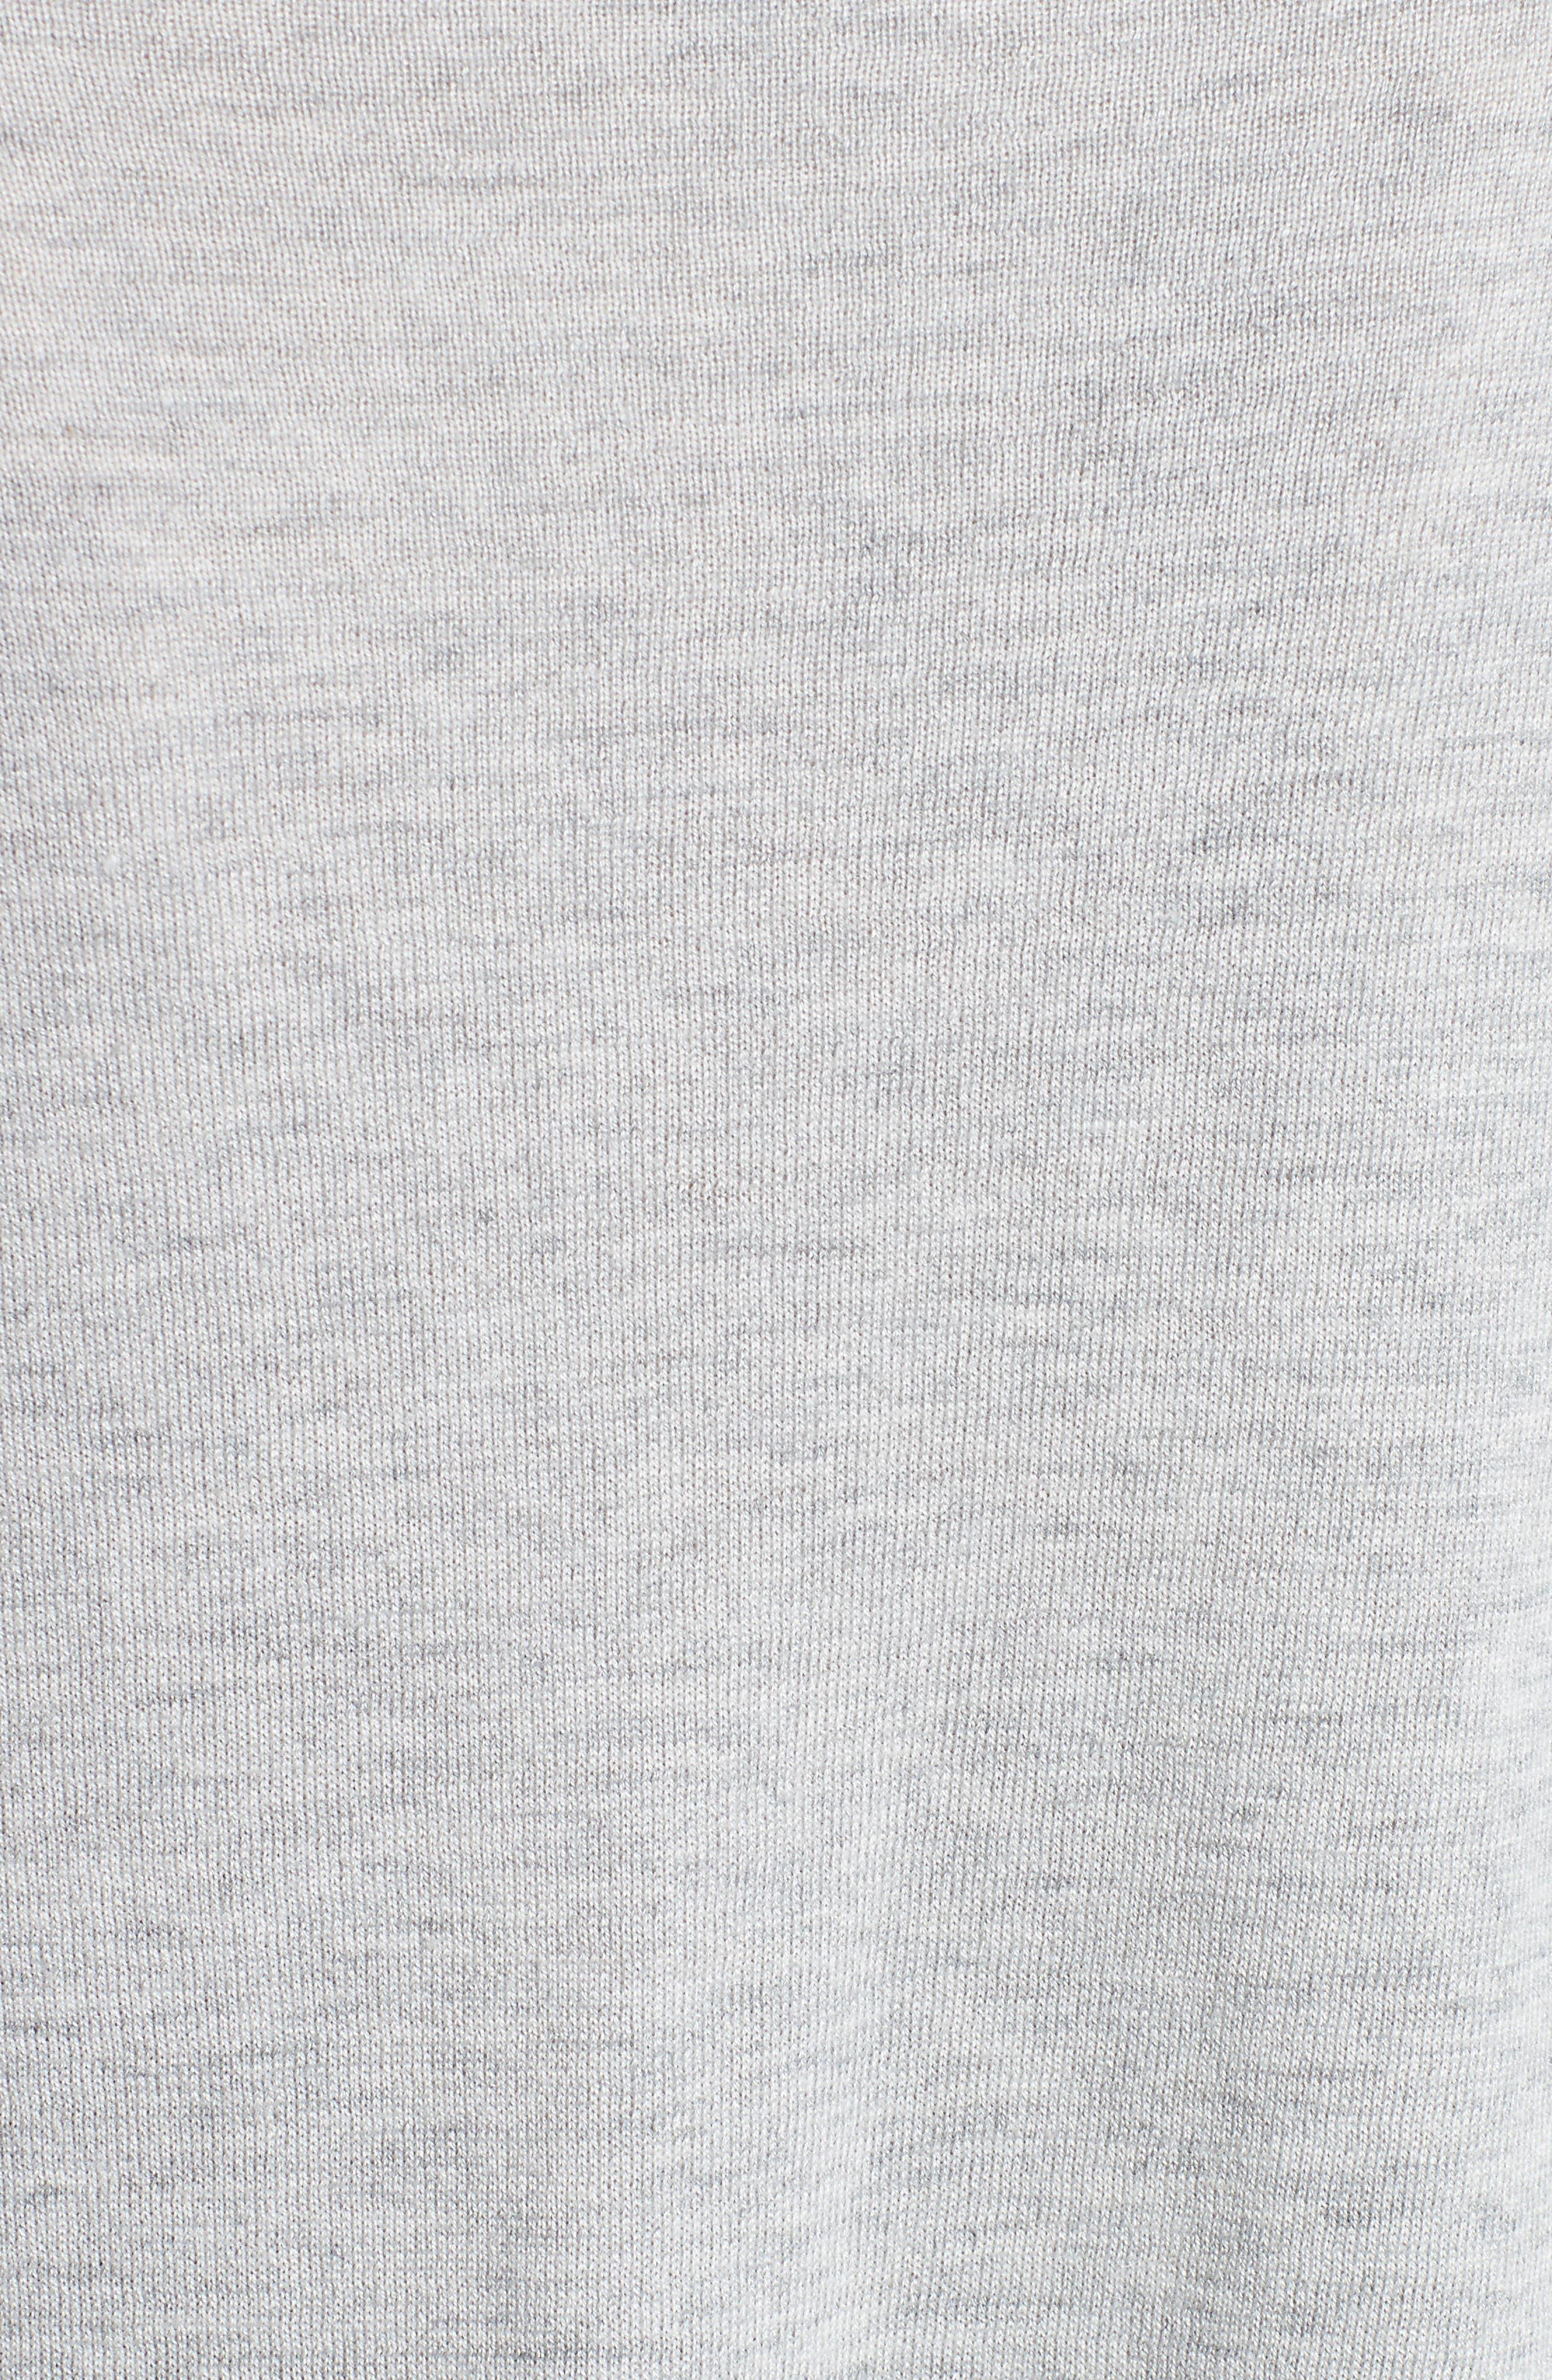 JOIE,                             Eloisa Sweater,                             Alternate thumbnail 5, color,                             051